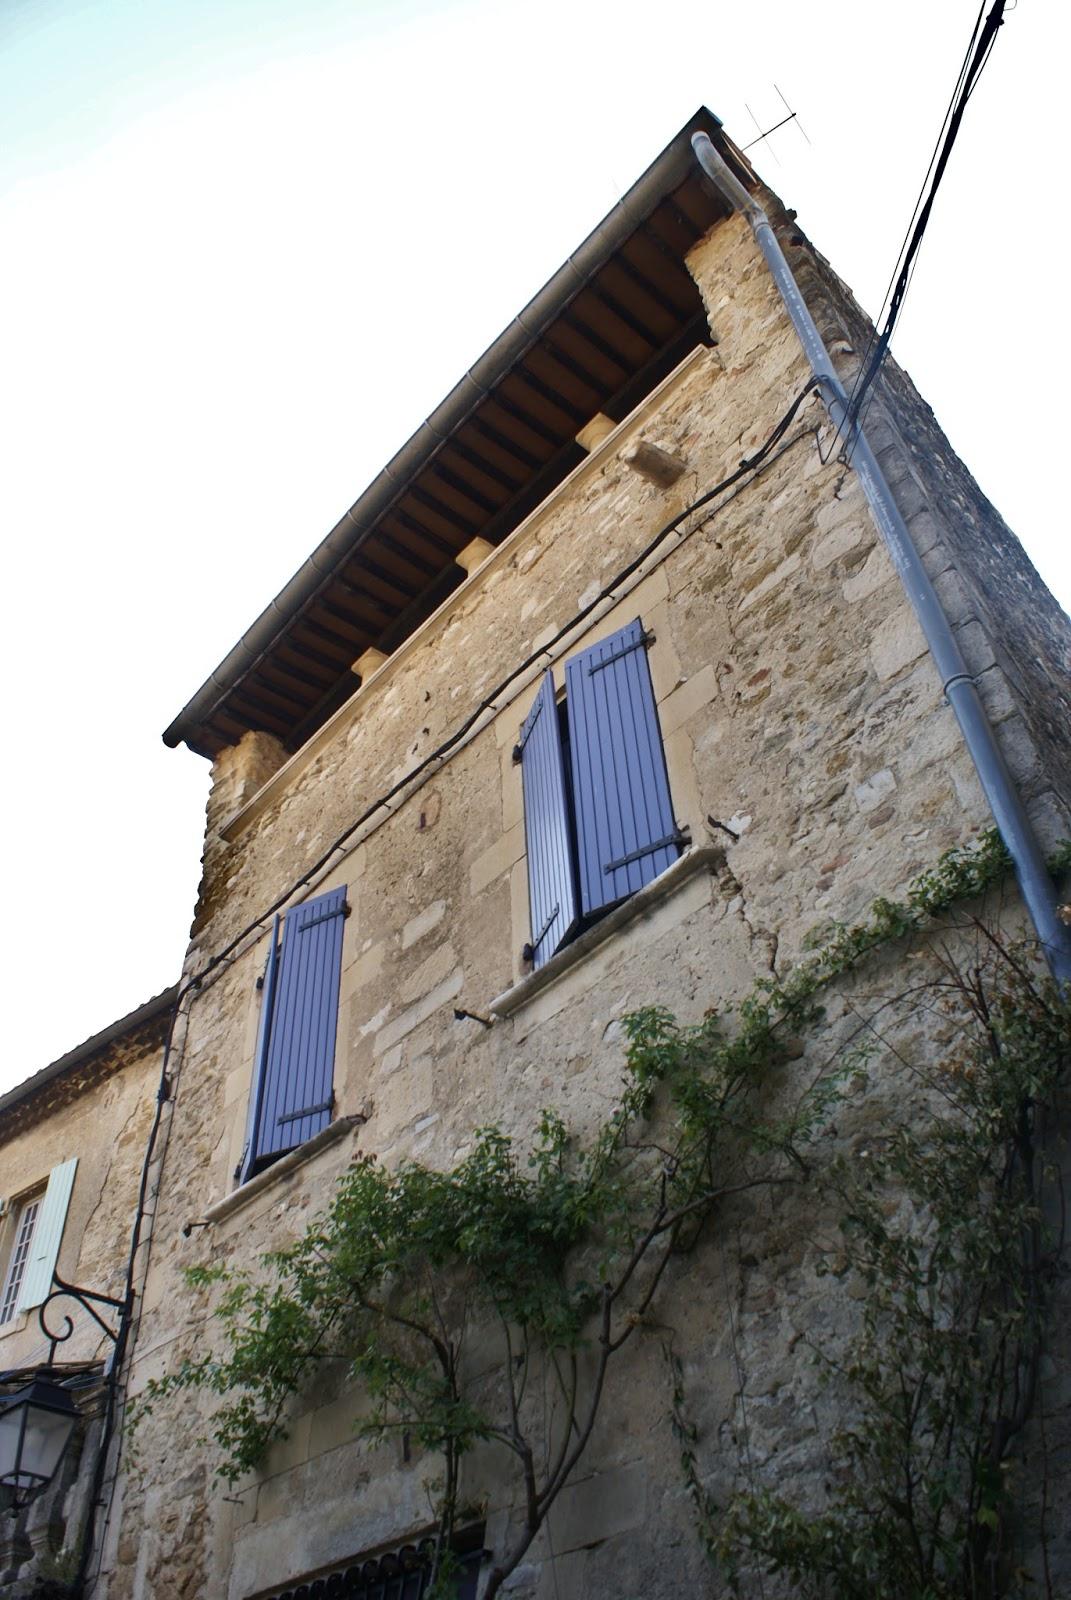 grignan drome provence rhone alpes france